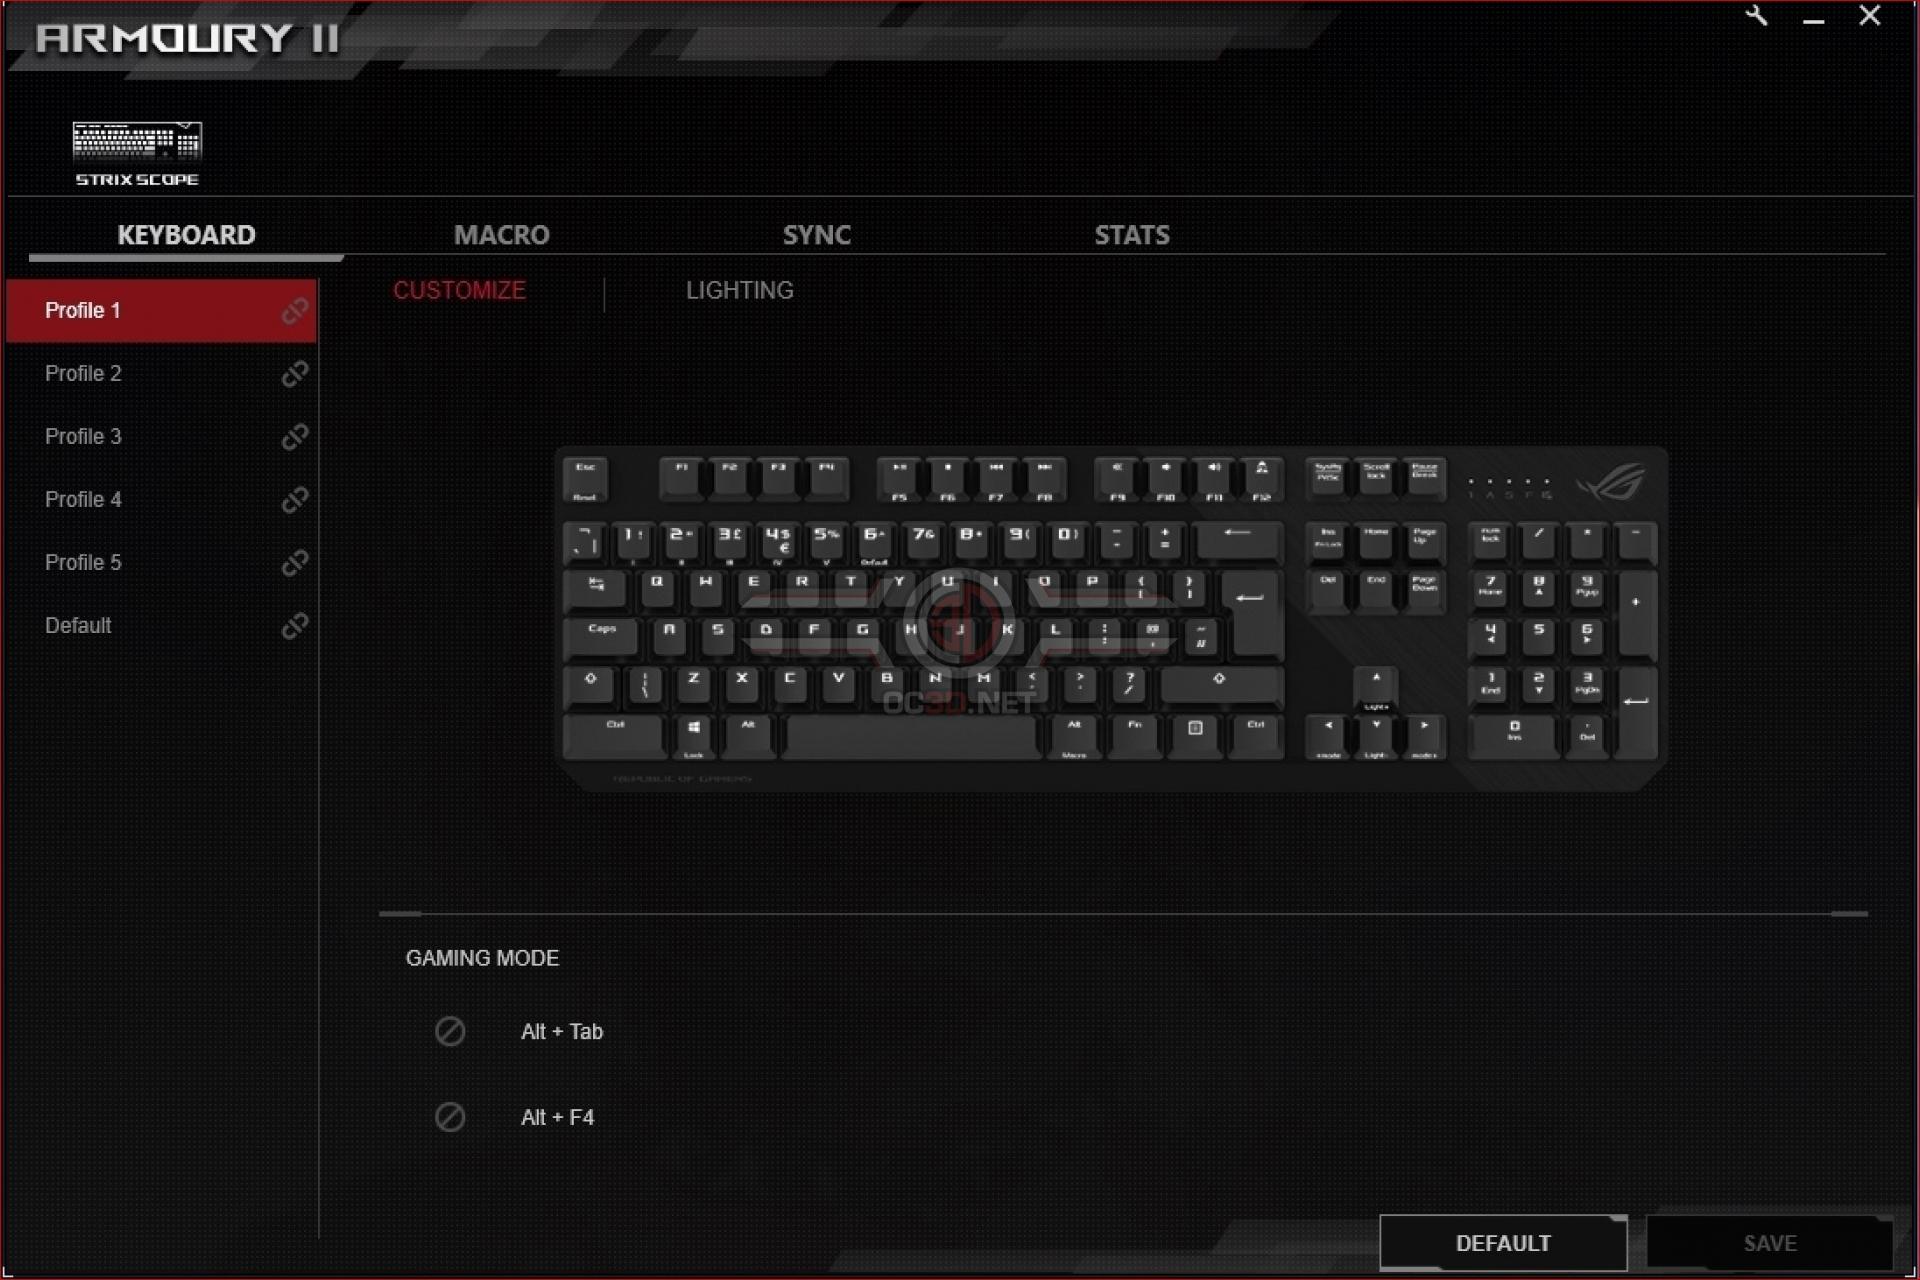 ASUS ROG Strix Scope Gaming Keyboard | Software and Lighting | Input